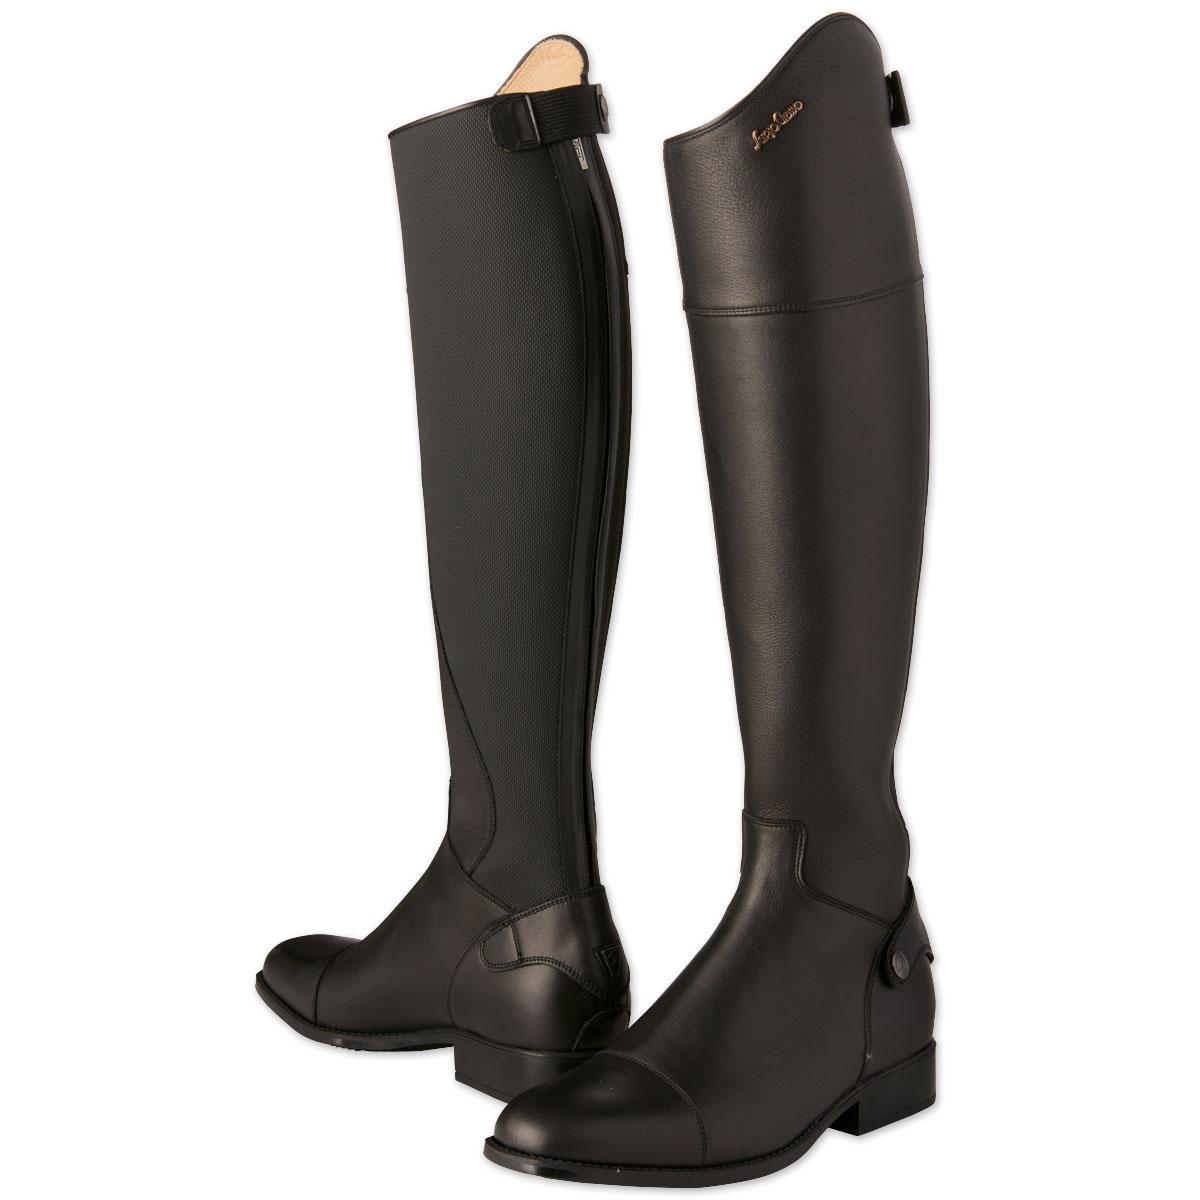 Sergio Grasso Progress Tall Boot Absolute Black Size